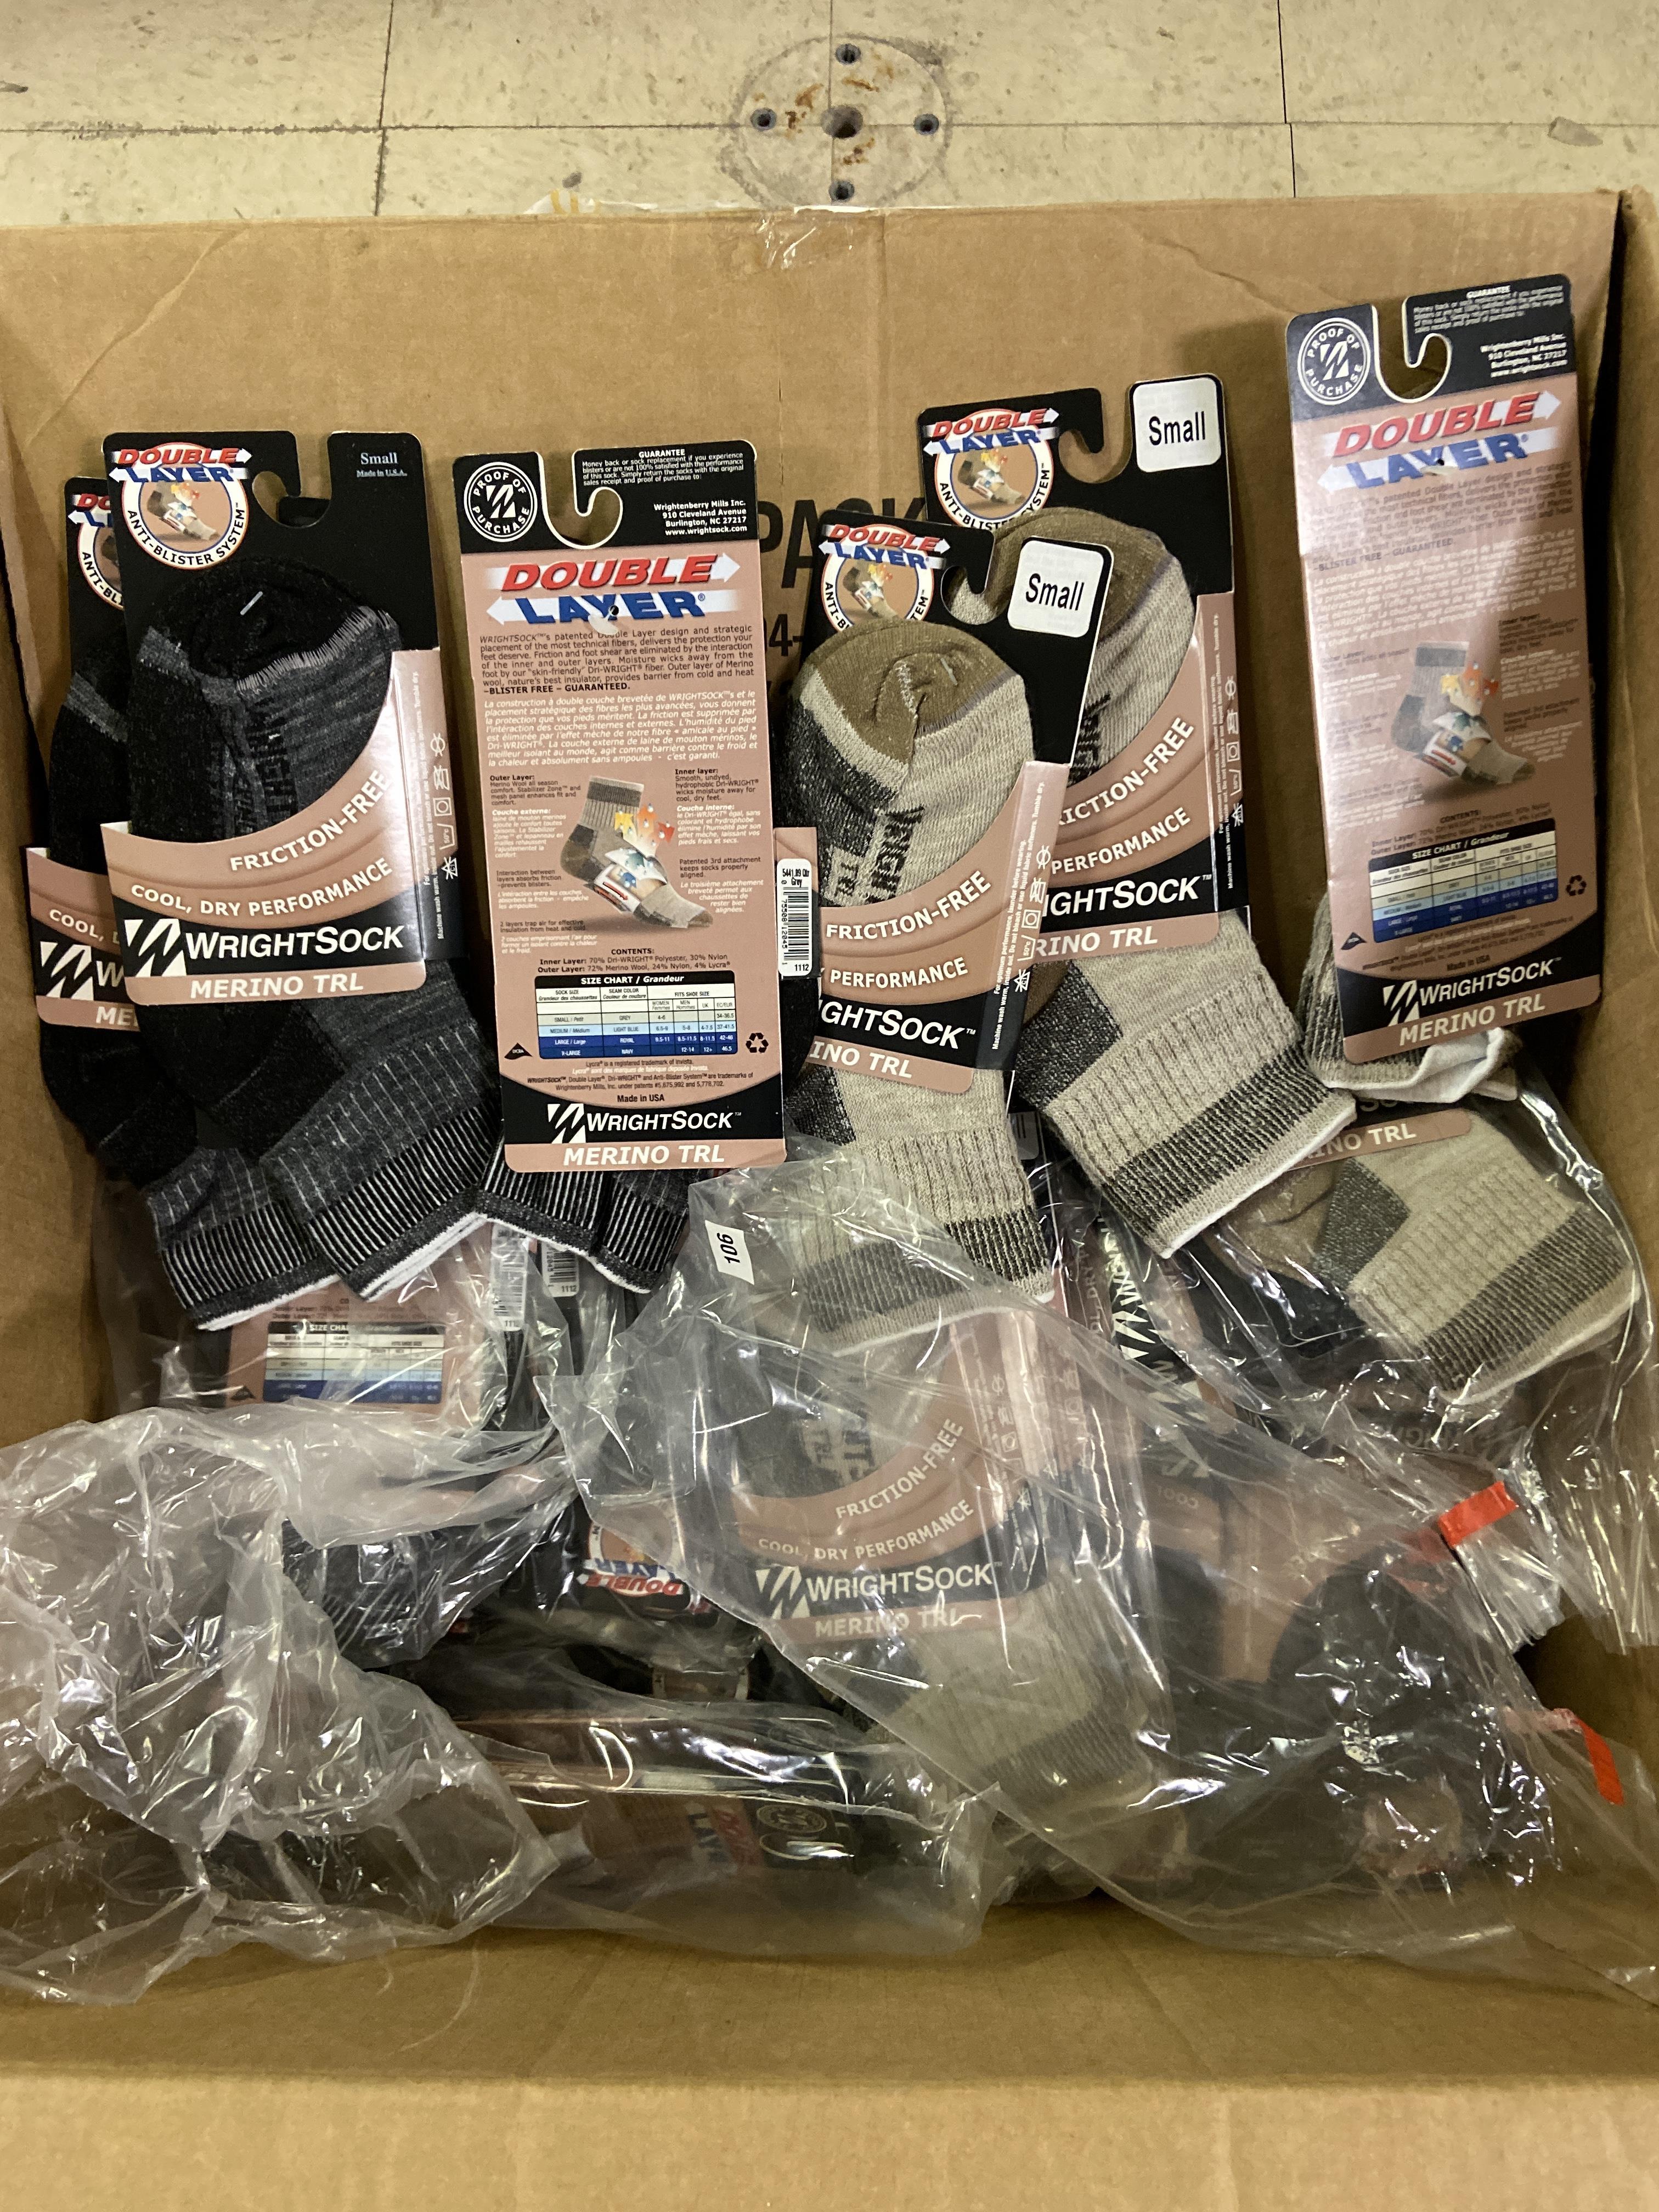 250+ packs of New Socks, Wrightsocks Merino TRL, Double Layer, Black/Gray/Tan